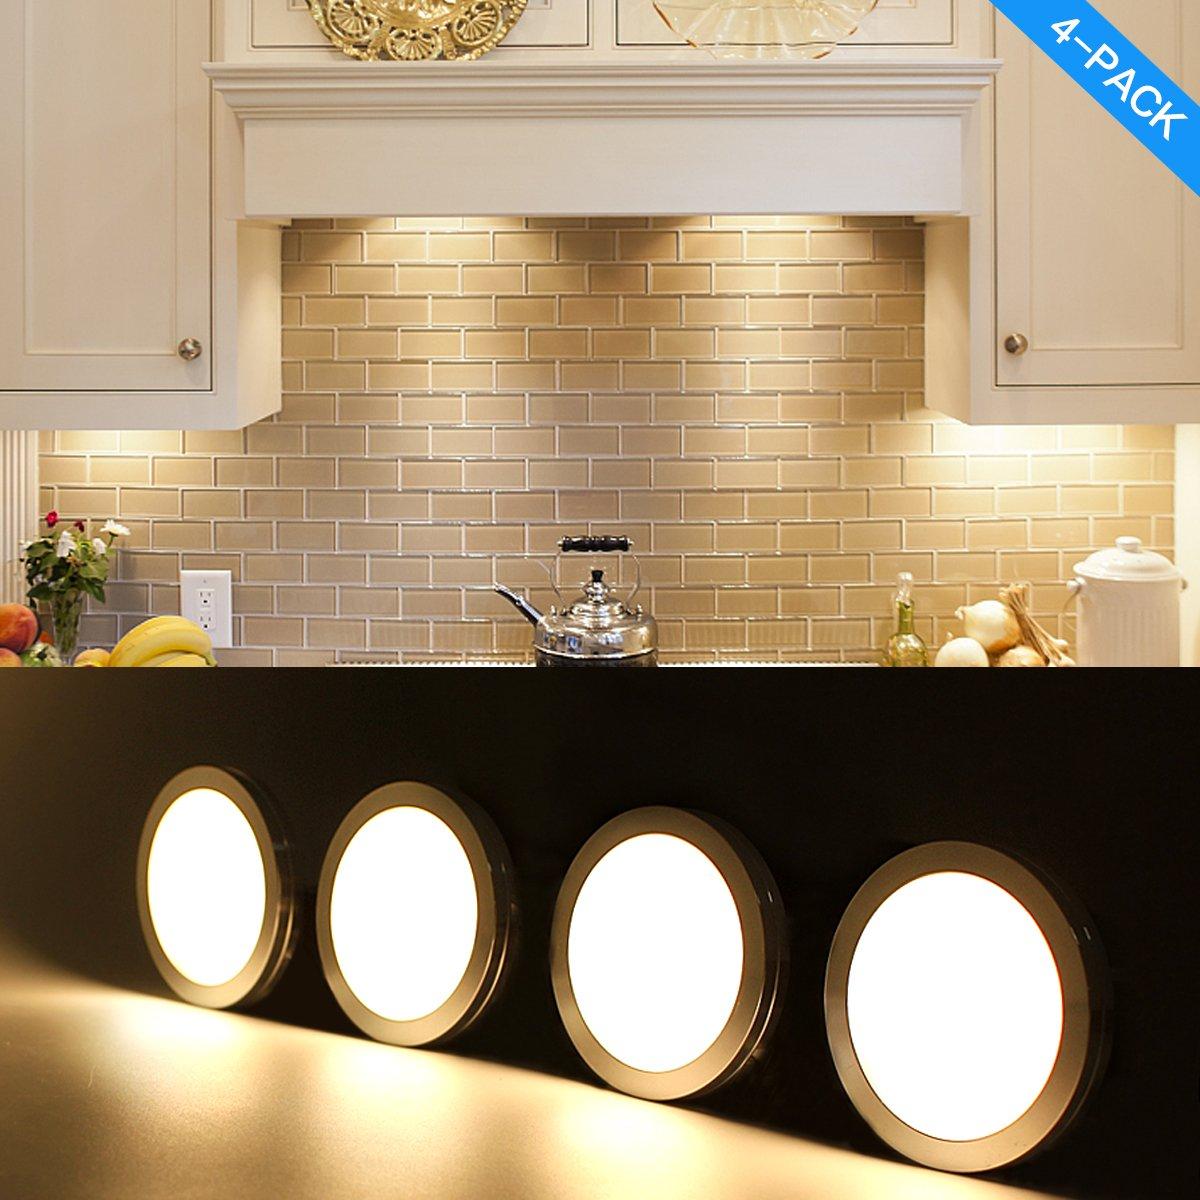 counter kitchen lighting. LED Under Cabinet Lighting Kit 700lm Puck Lights Counter Kitchen Lighting,Closet Light ,Shelf Lighting,3000K Warm White CRI\u003e80,Backed 3M Tape,UL R